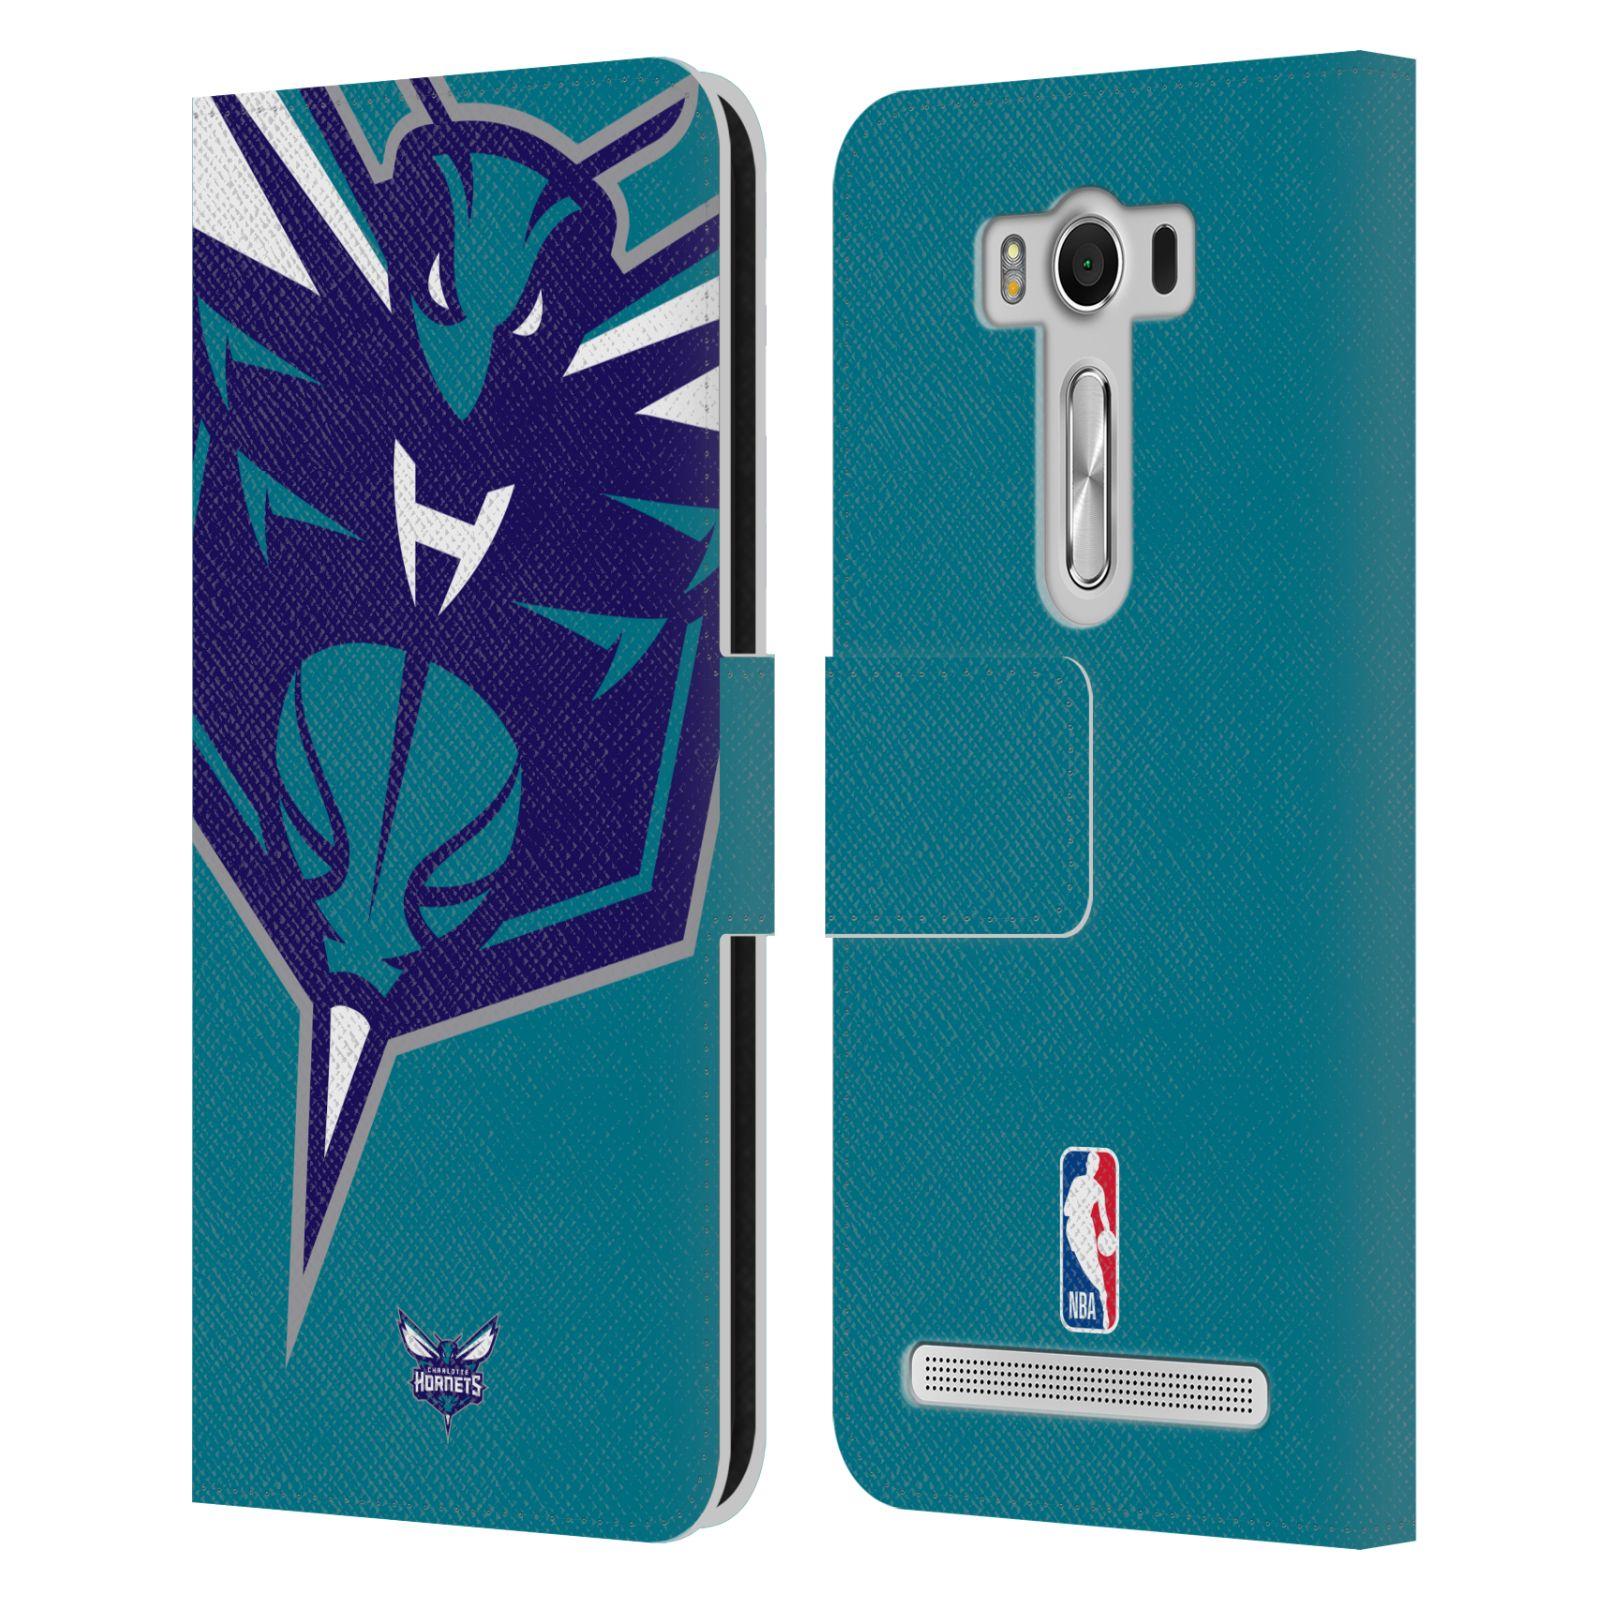 Pouzdro na mobil Asus Zenfone 2 Laser ZE500KL - Head Case -NBA - Charlotte Hornets modrá barva velký znak